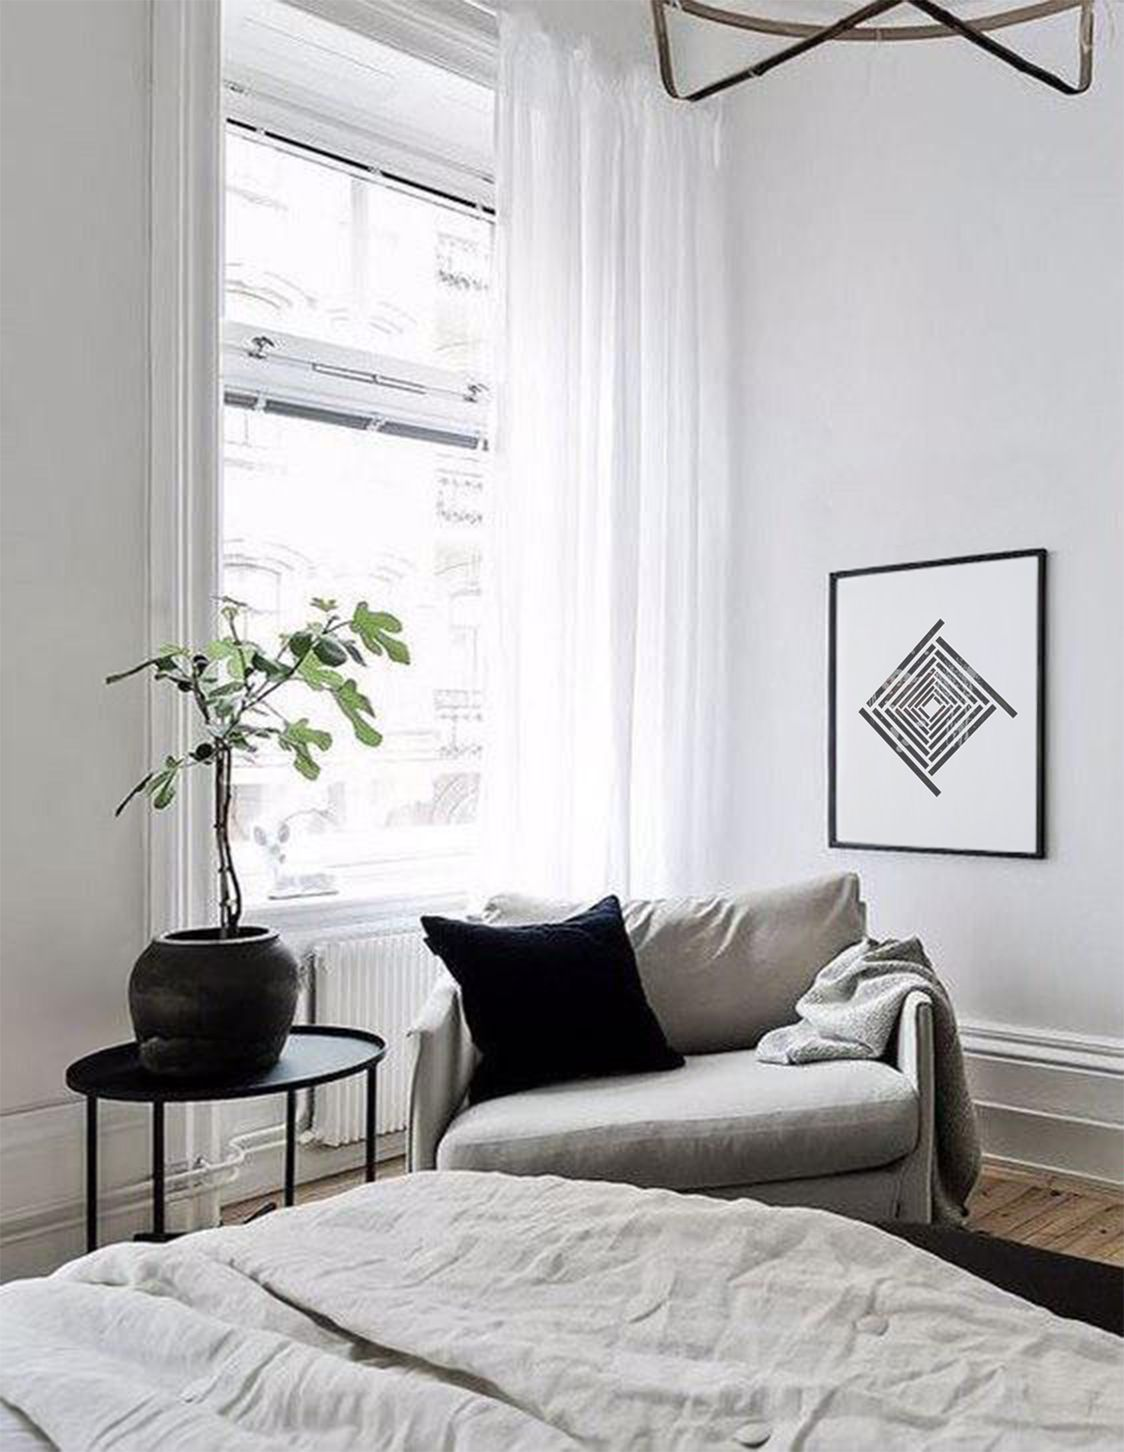 Black Abstract Art, Minimalism, Geometric Art, Printable Art, Digital Print, Minimalist Print, Home Decor, Office Decor, Bedroom Art, Poster